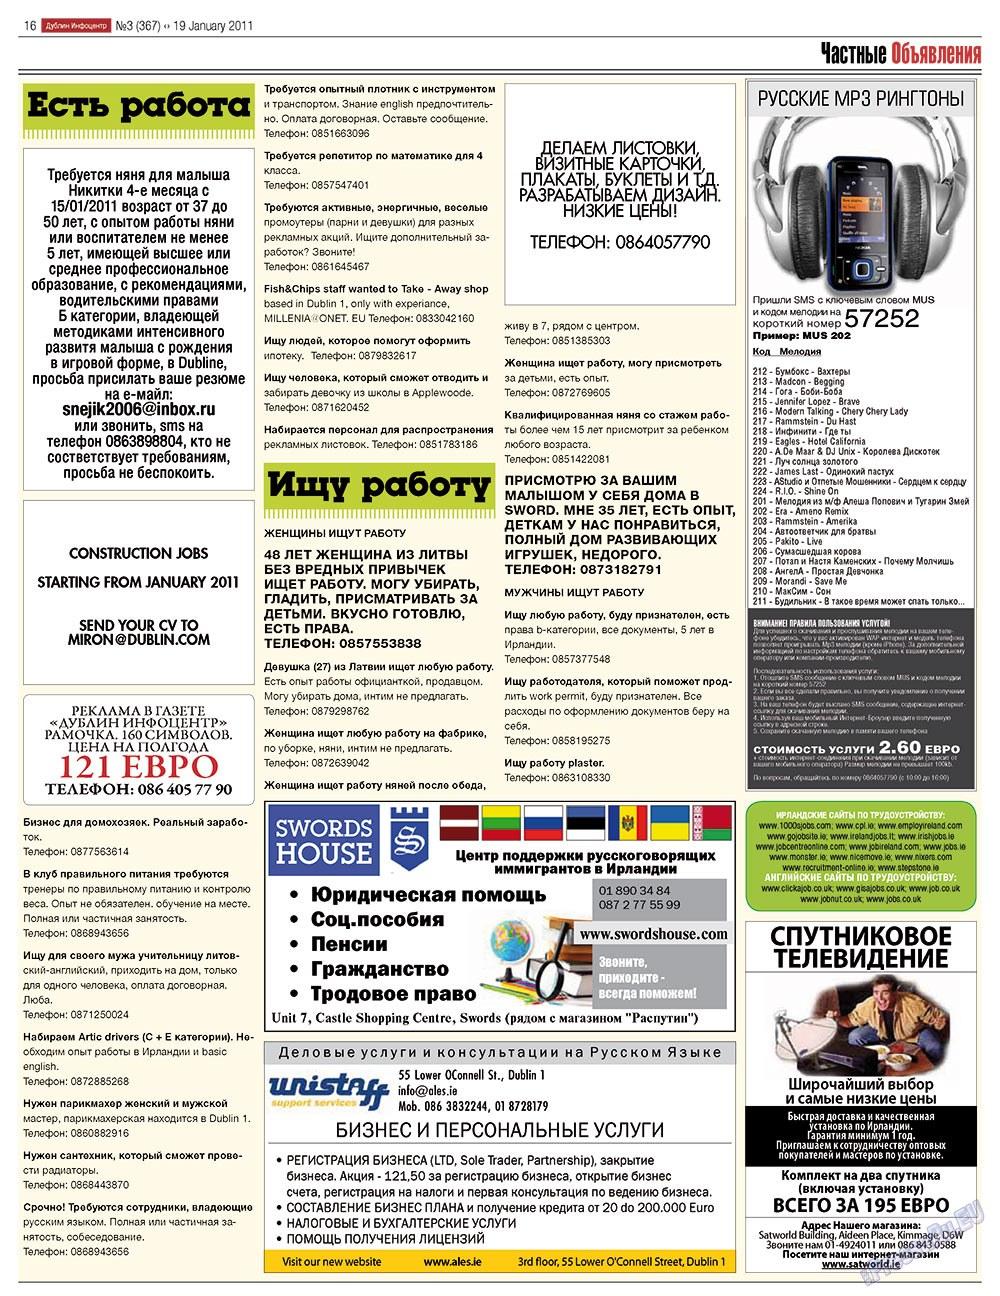 Дублин инфоцентр (газета). 2011 год, номер 3, стр. 16